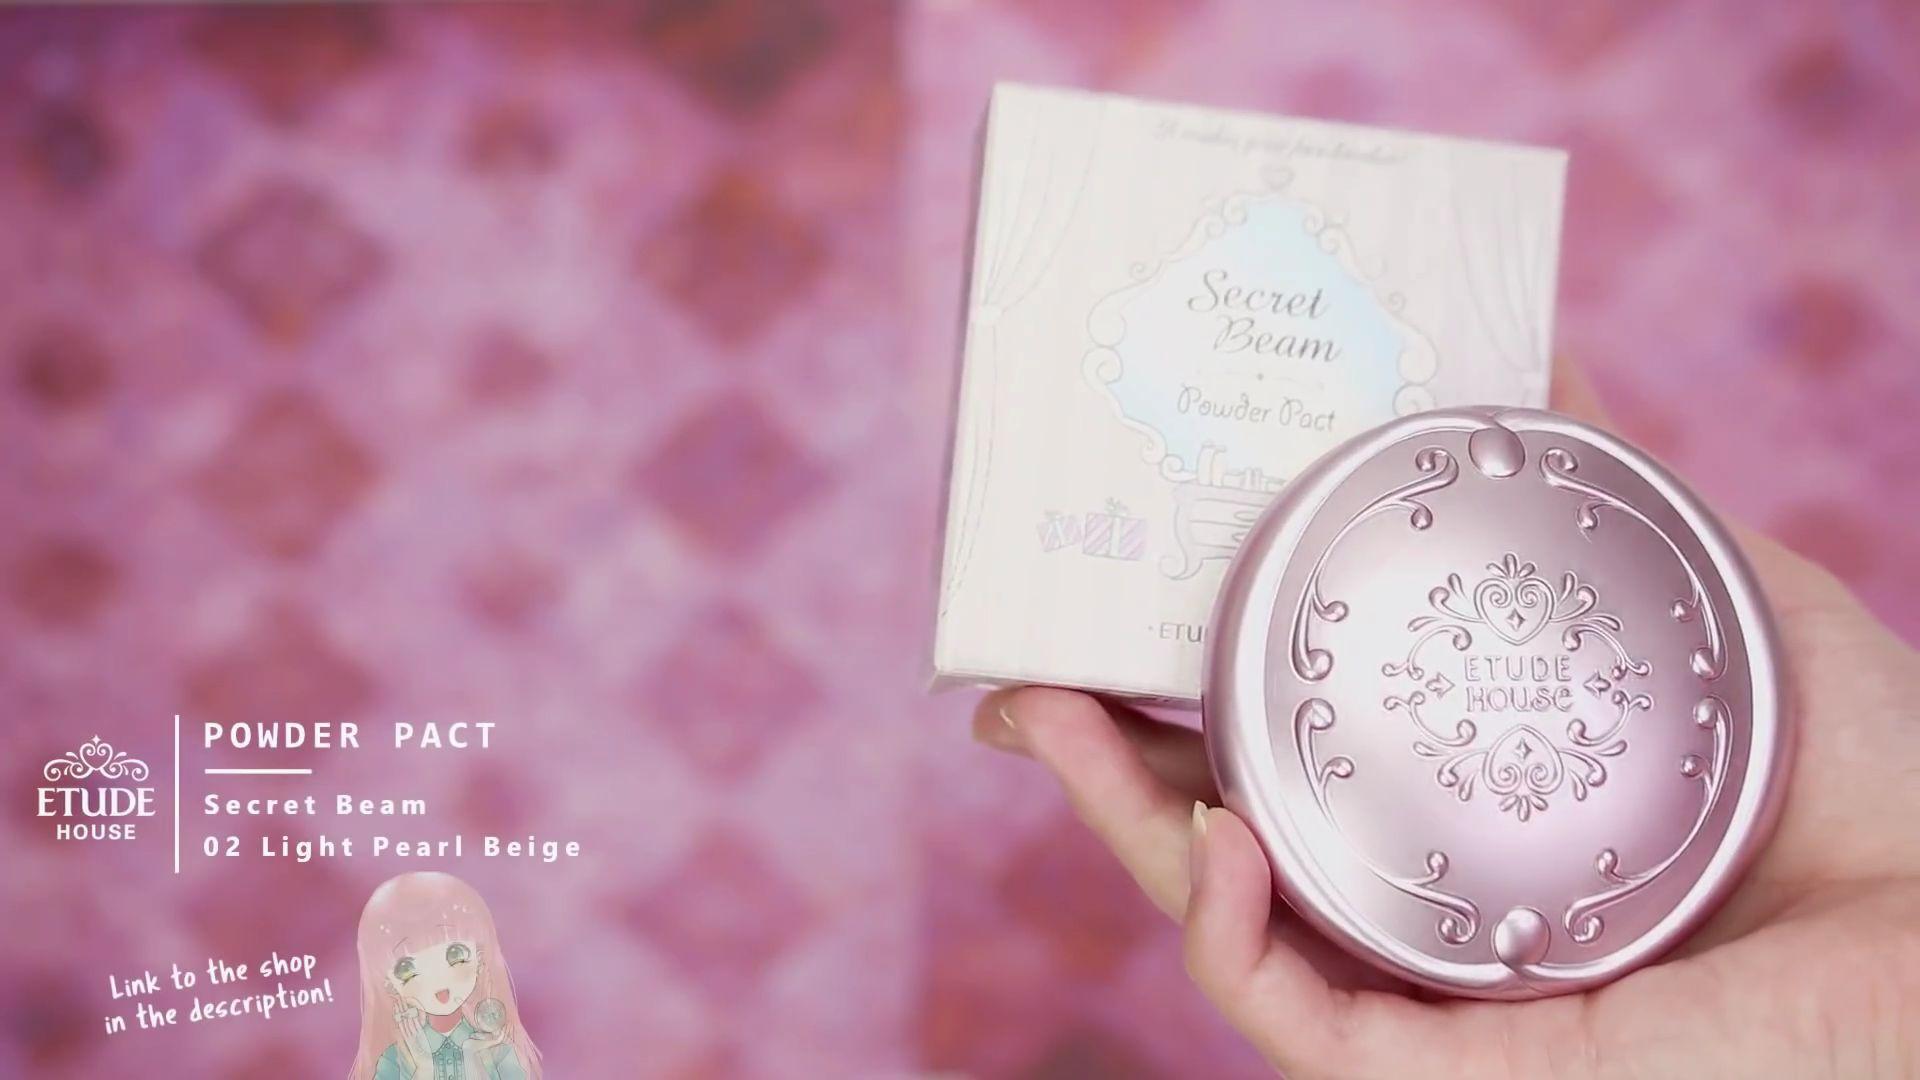 Misa Amane Cosplay DIY en 9 pasos: Powder Pact Secret Beam de tono 02 light Pearl Beige de la marca Etude House.